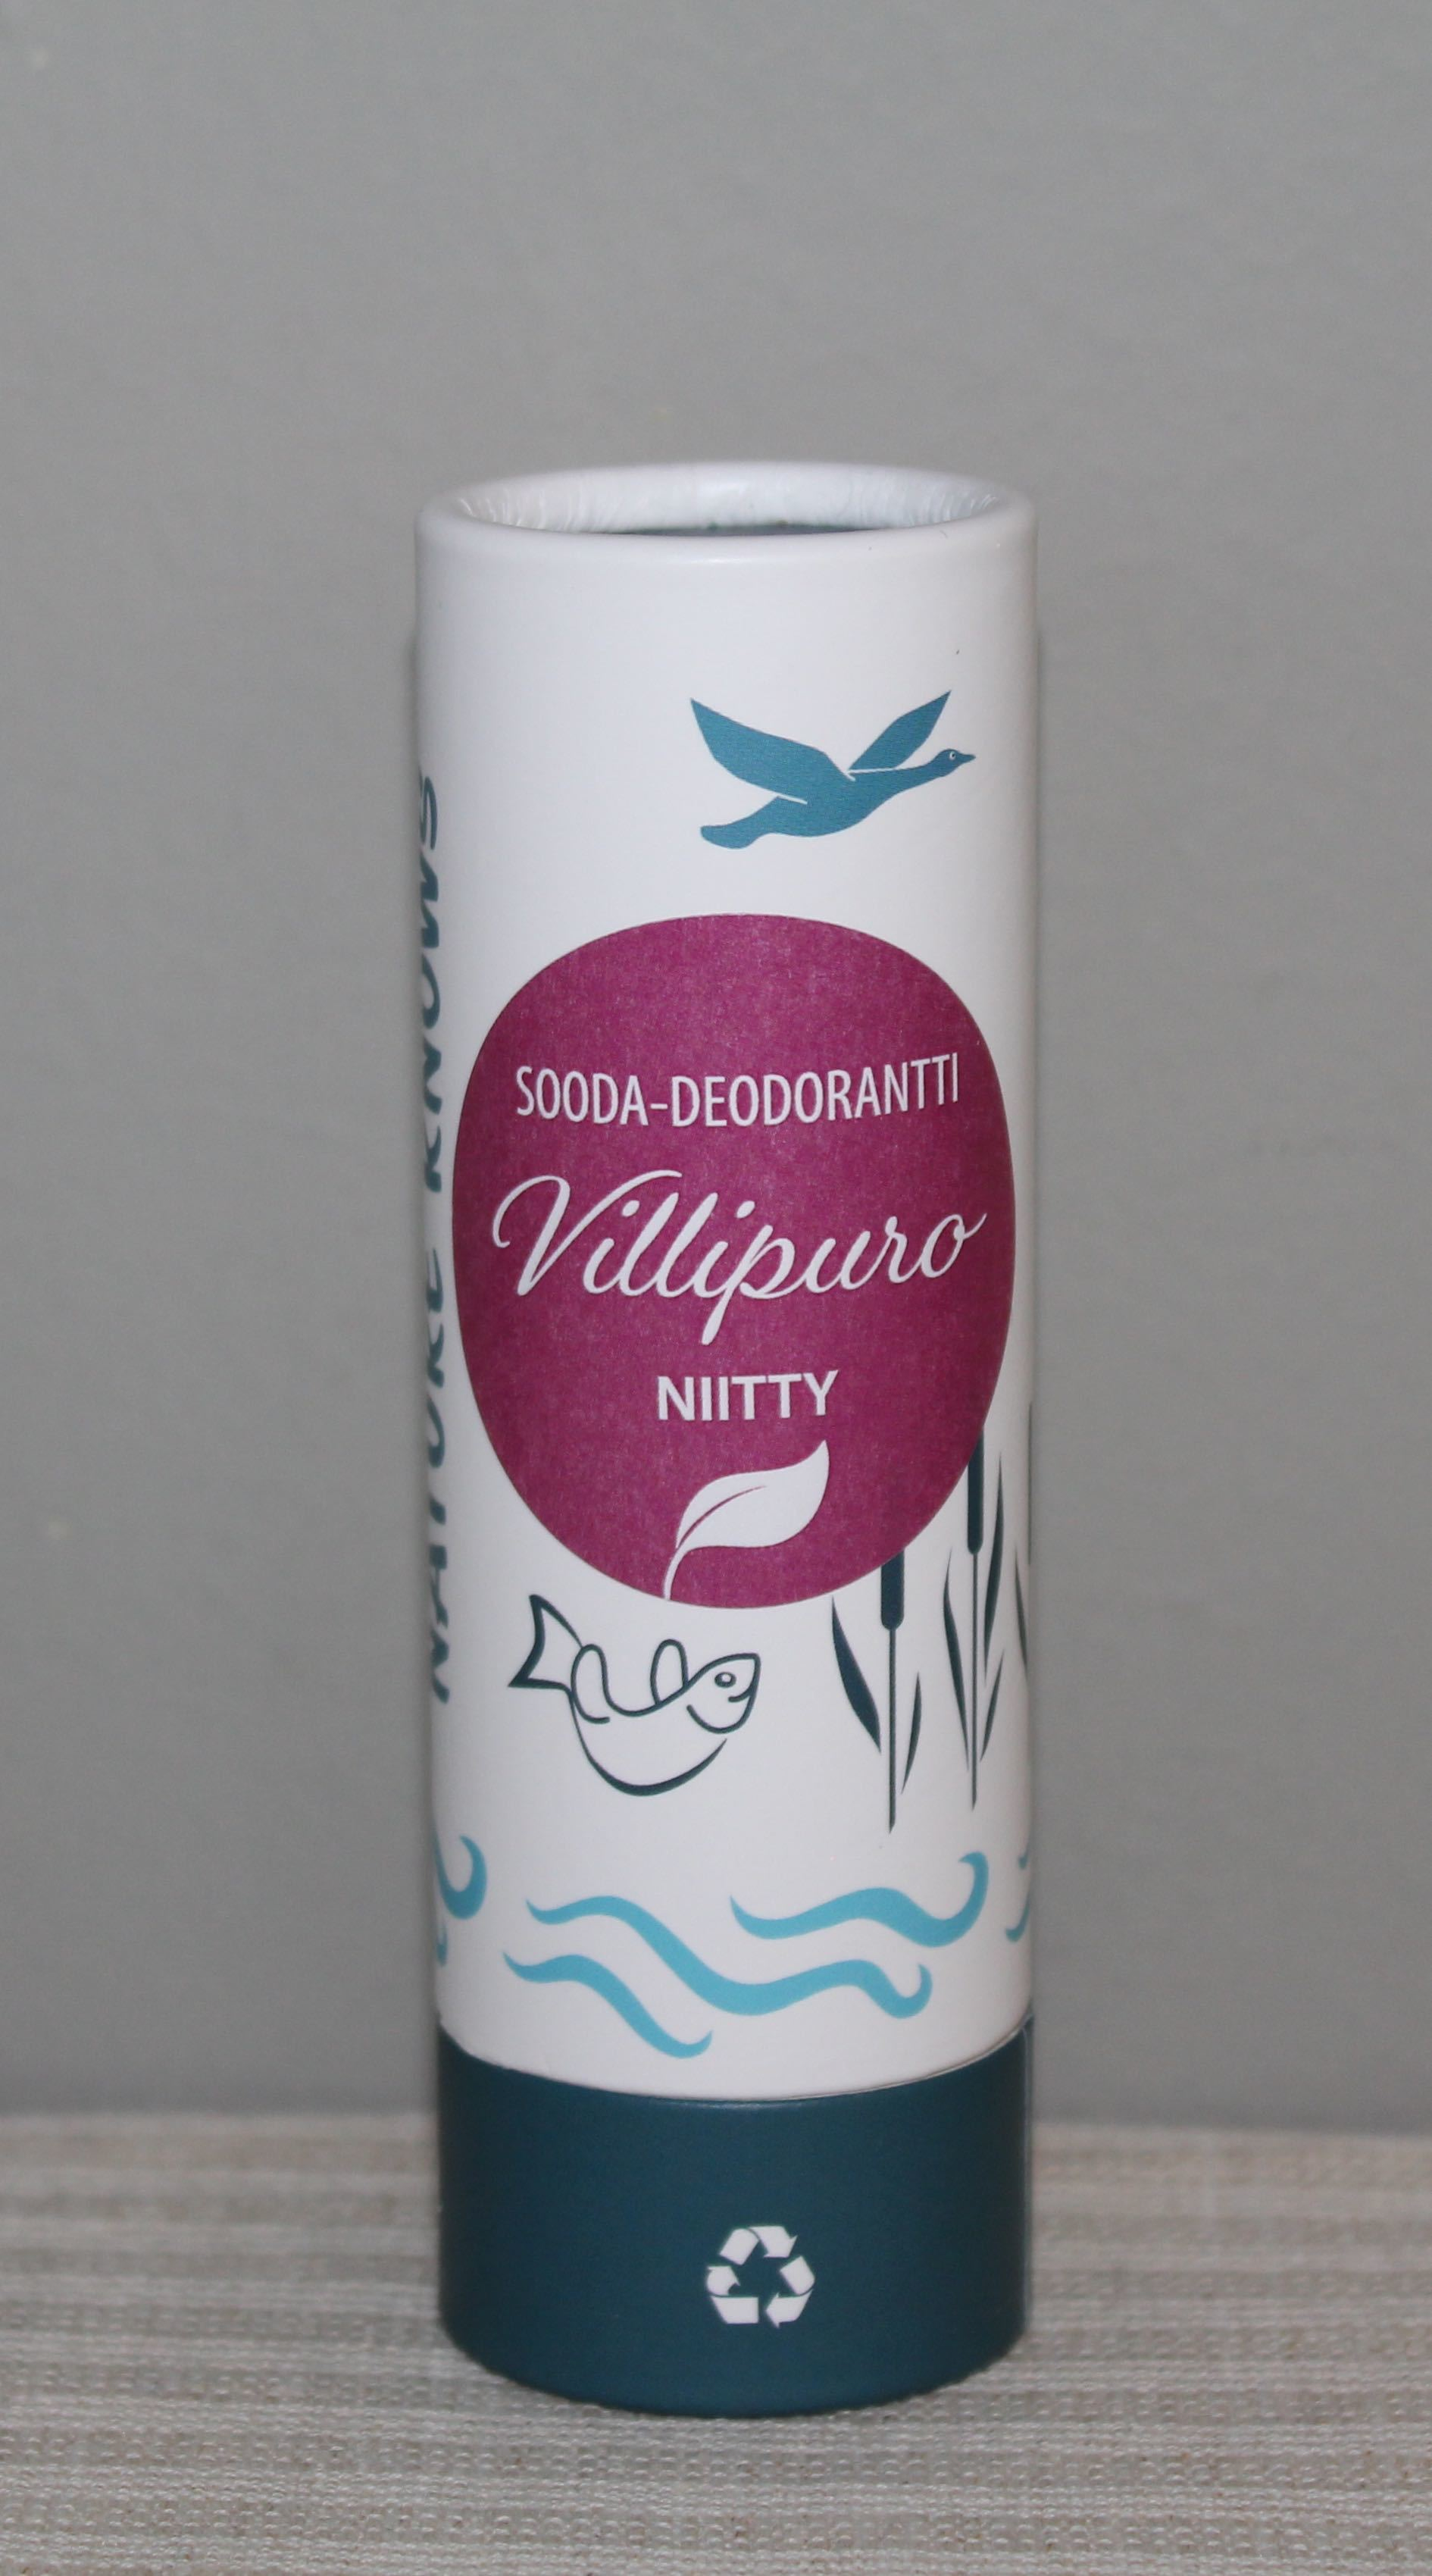 Villipuro NIITTY Sooda-deodorantti, 65g